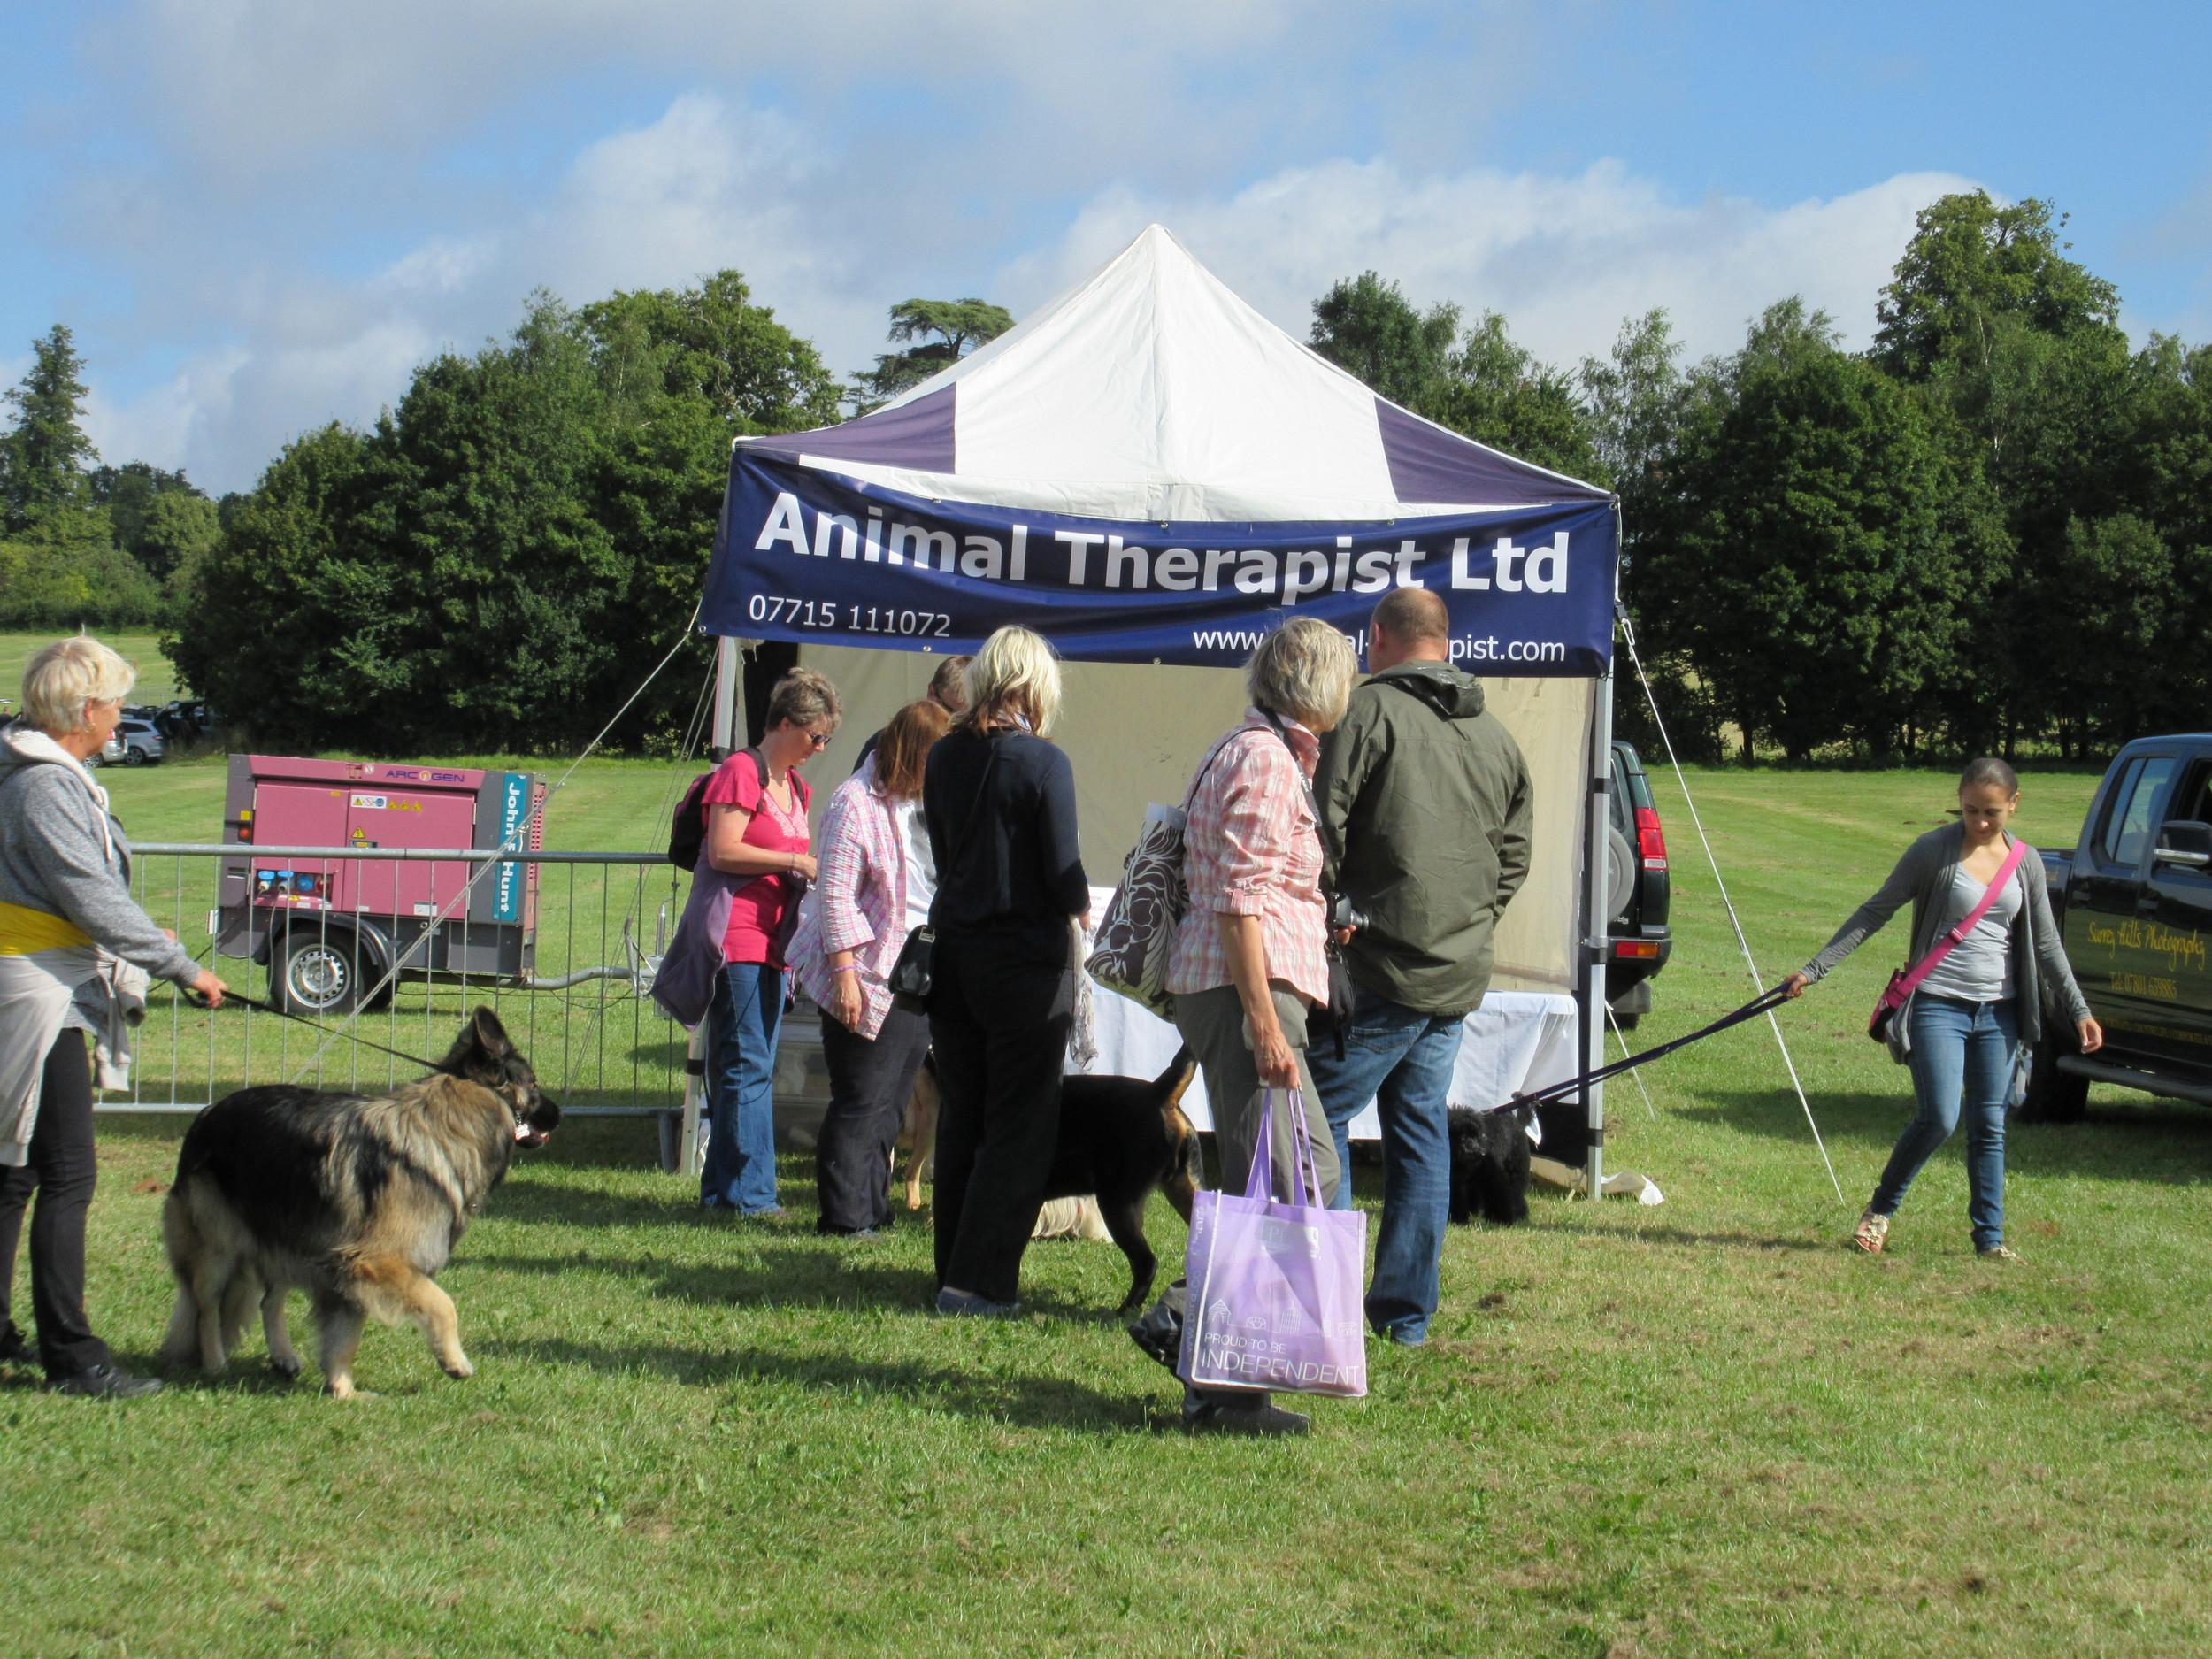 Animal Therapist Ltd Trade stand.jpg